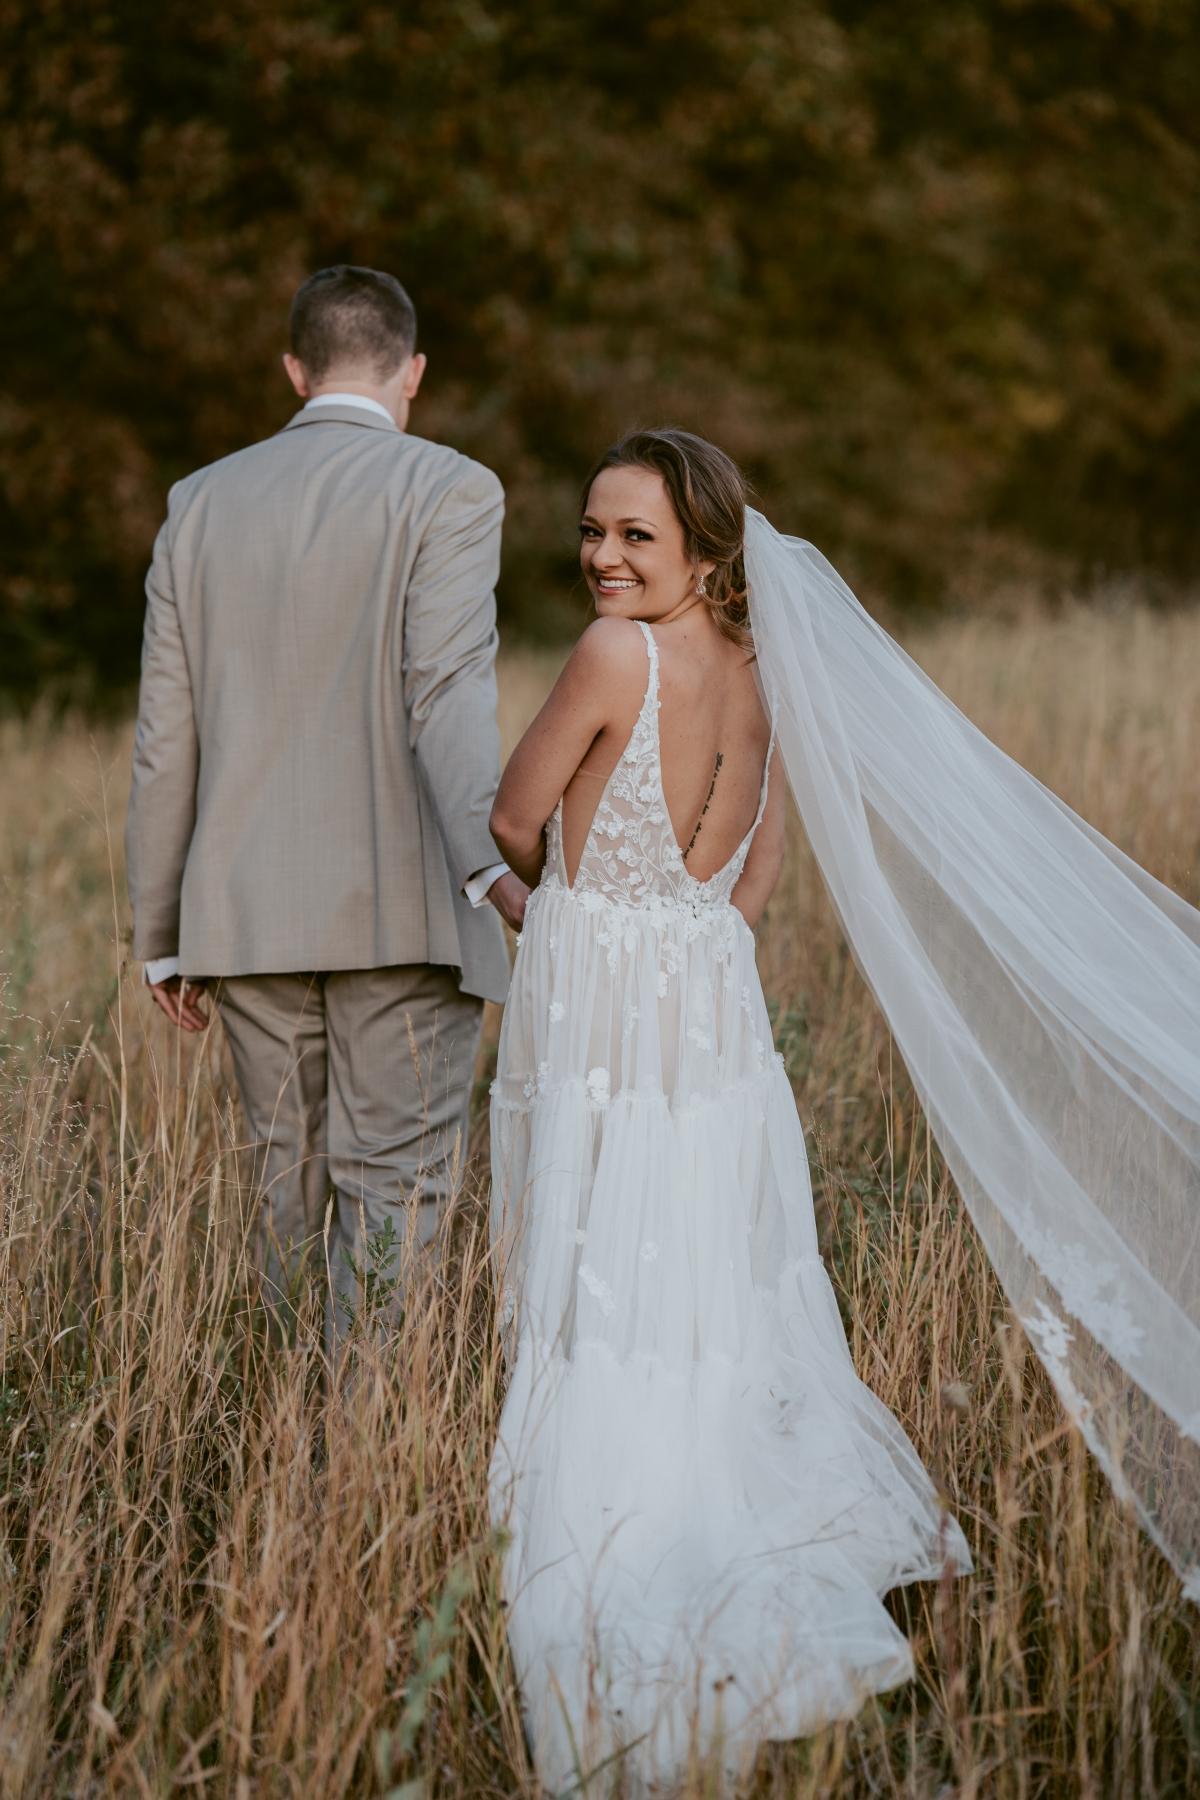 Millennium Moments Chicago Wedding Photographer 103